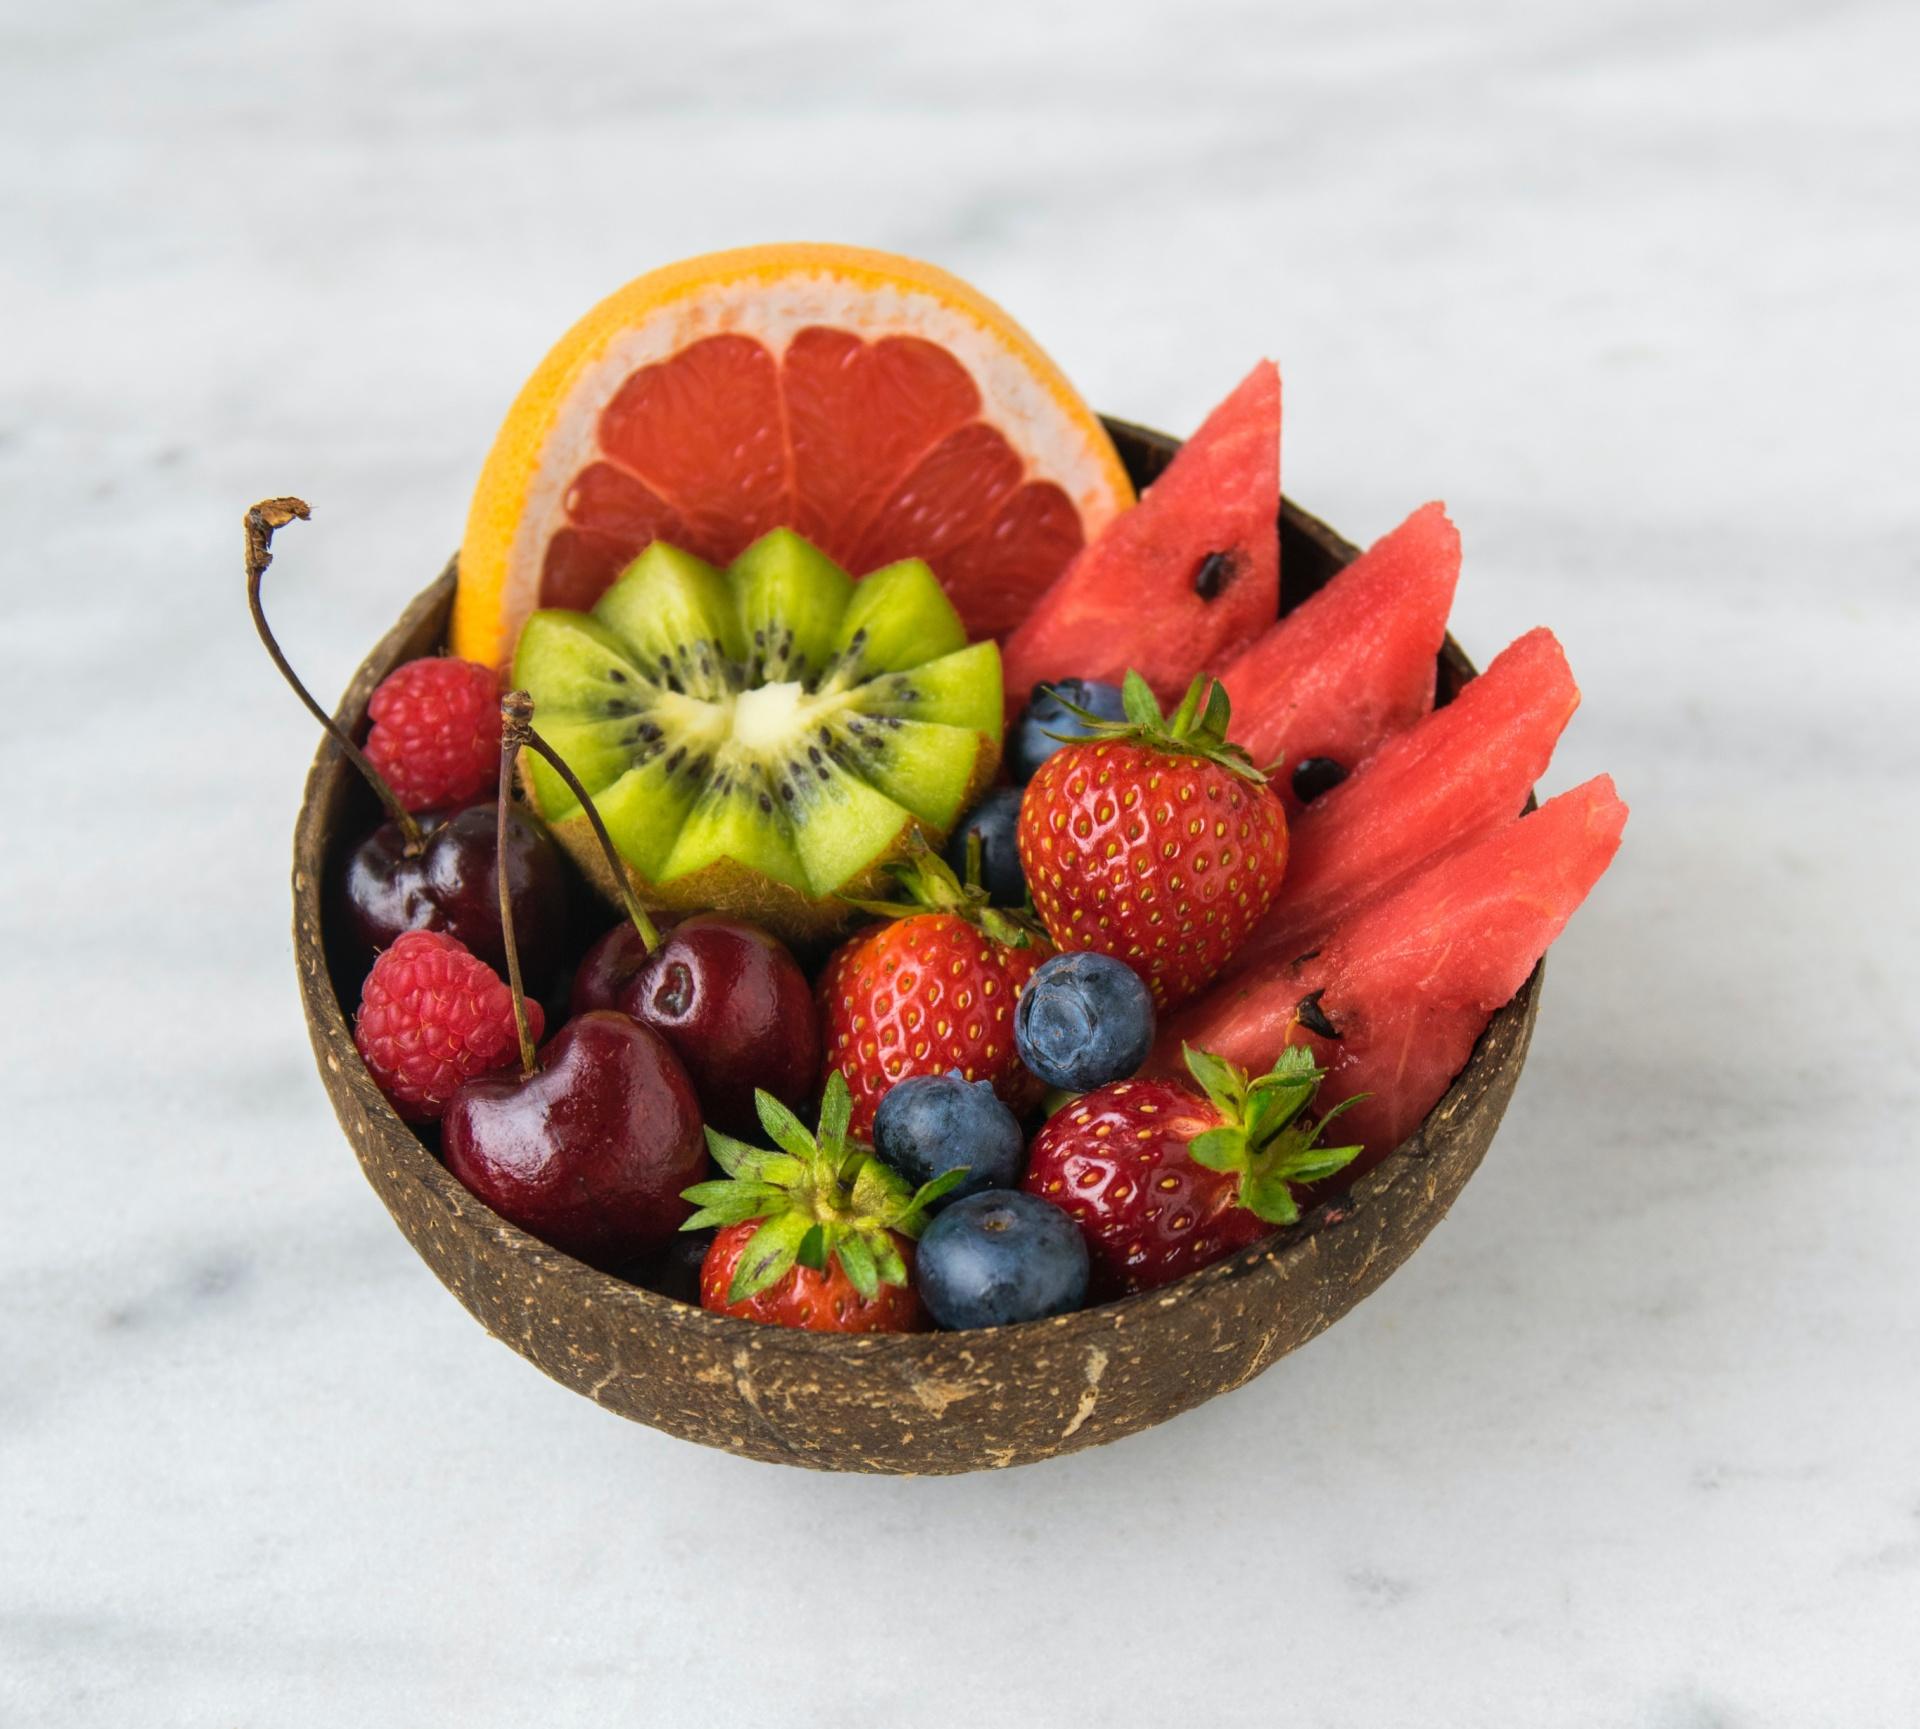 Health benefits of eating fruit